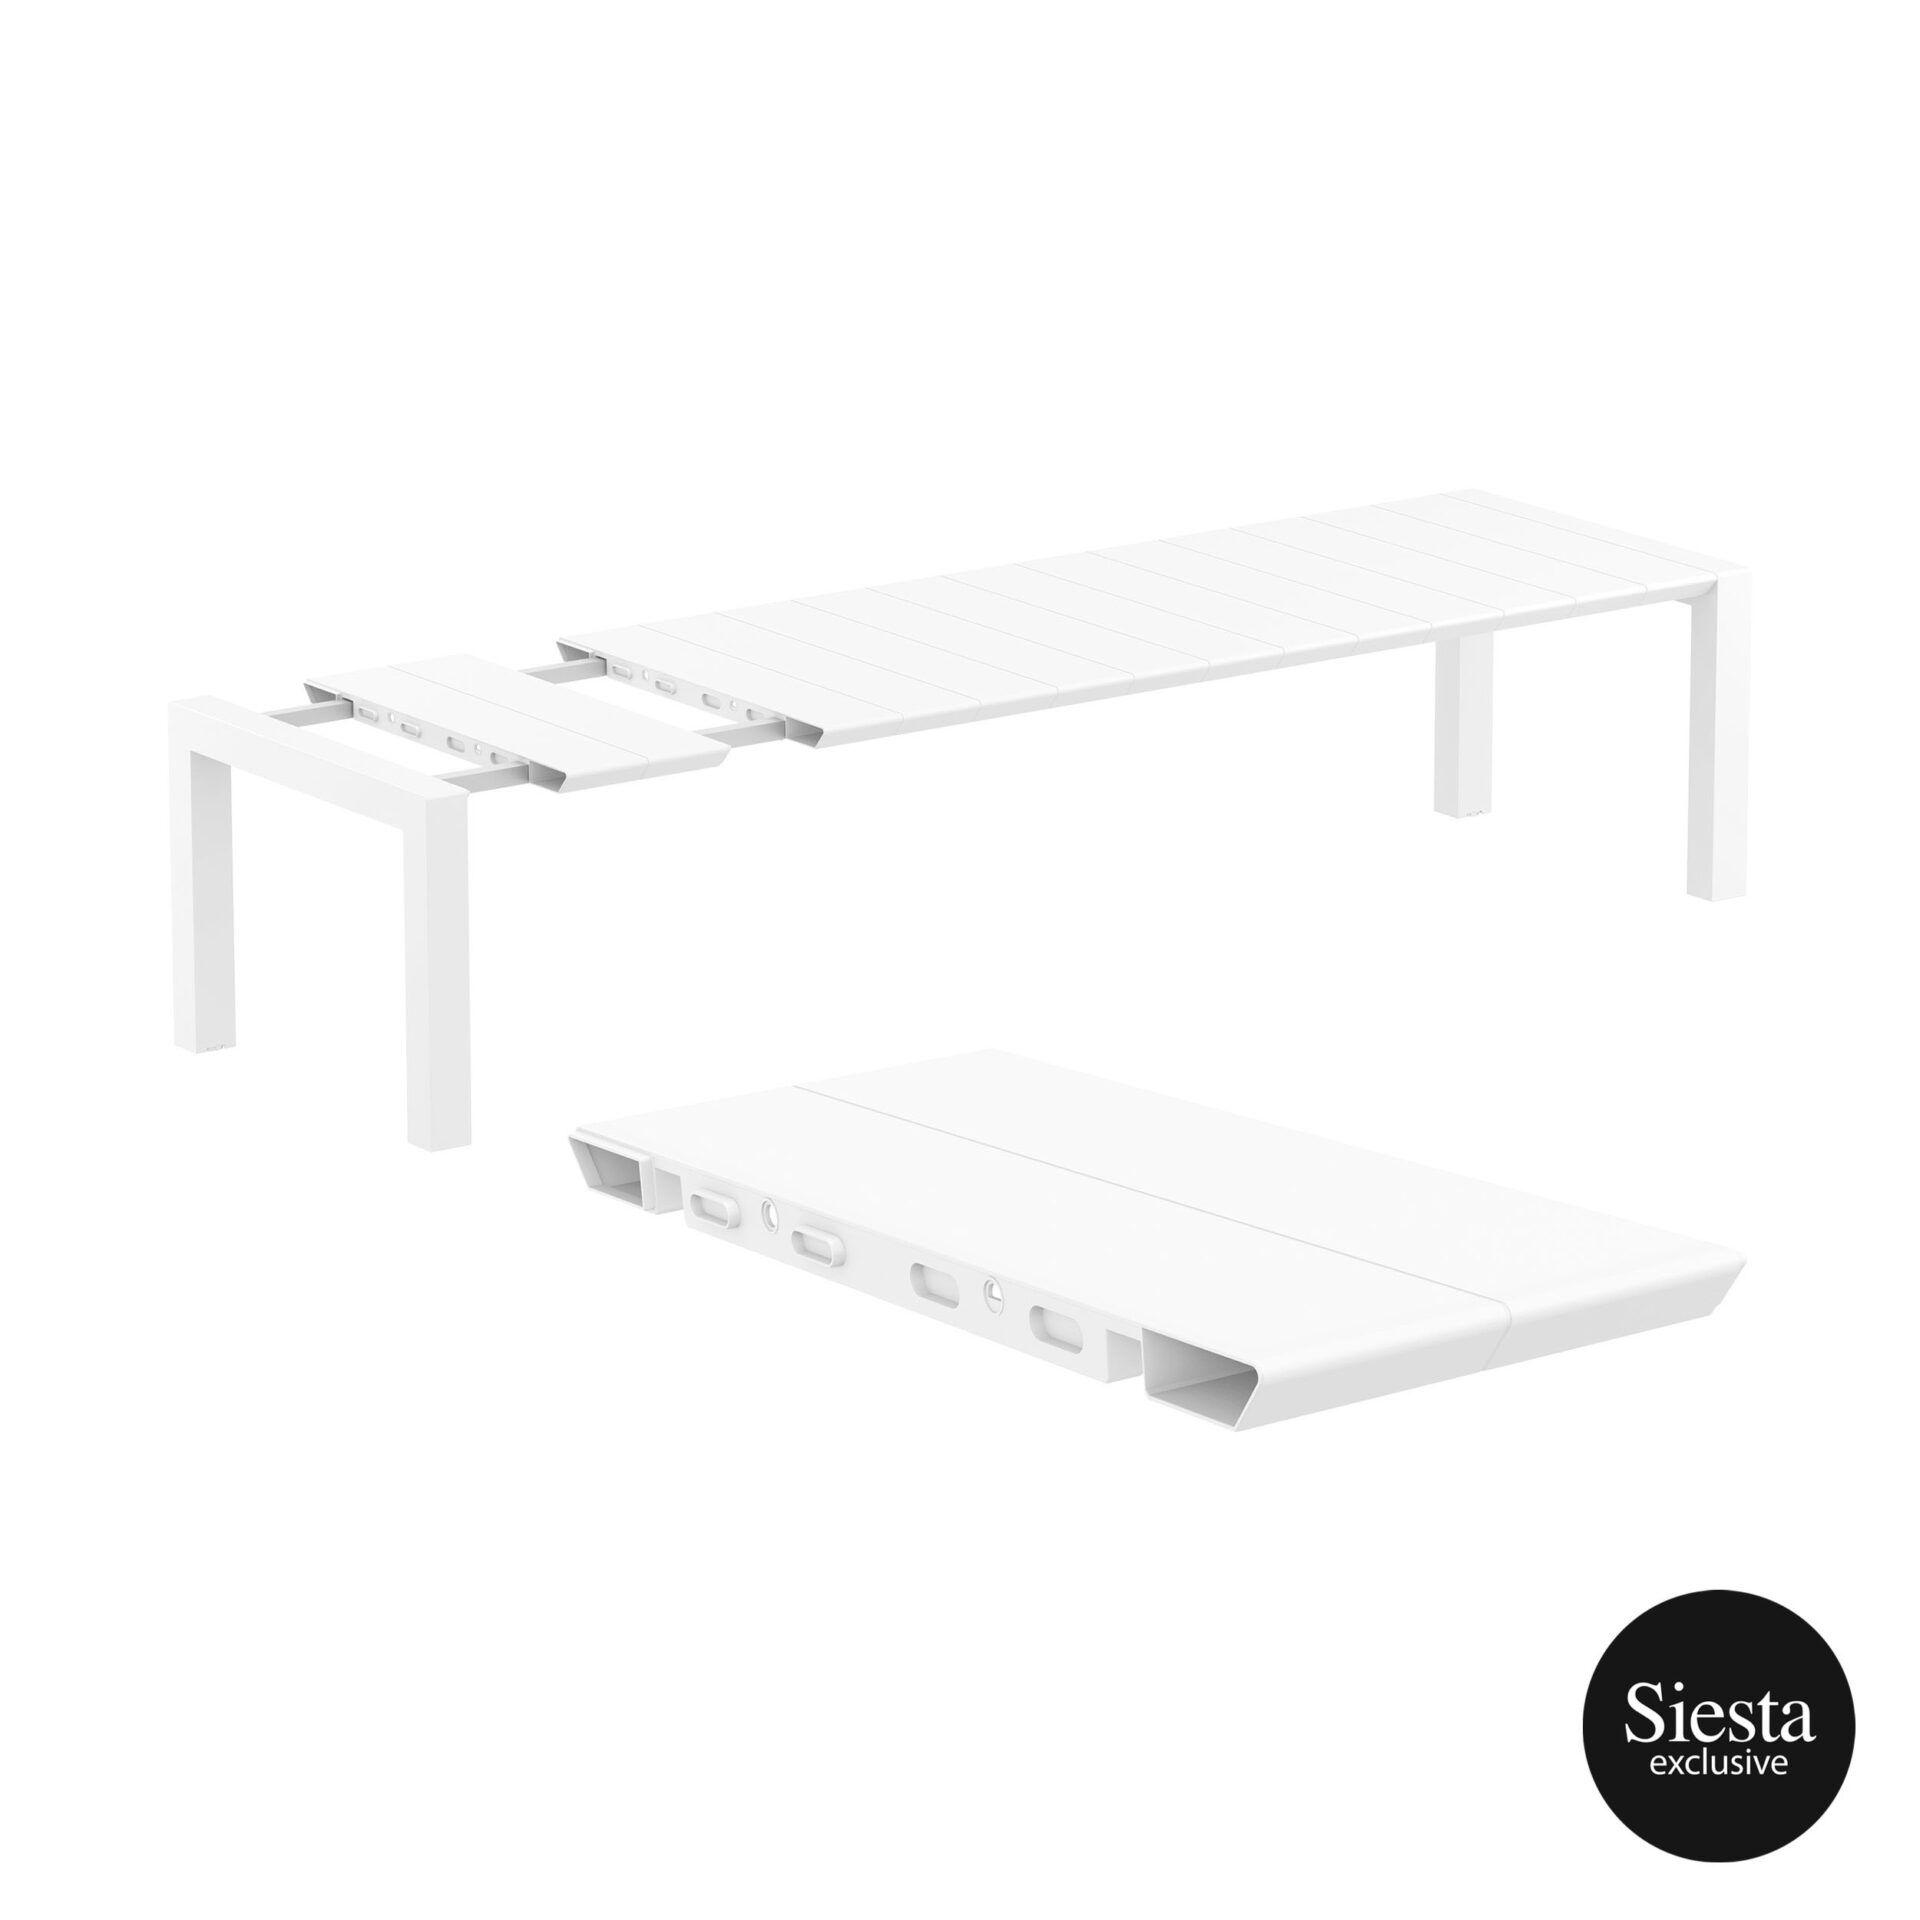 013 vegas table xl 300 white extension part